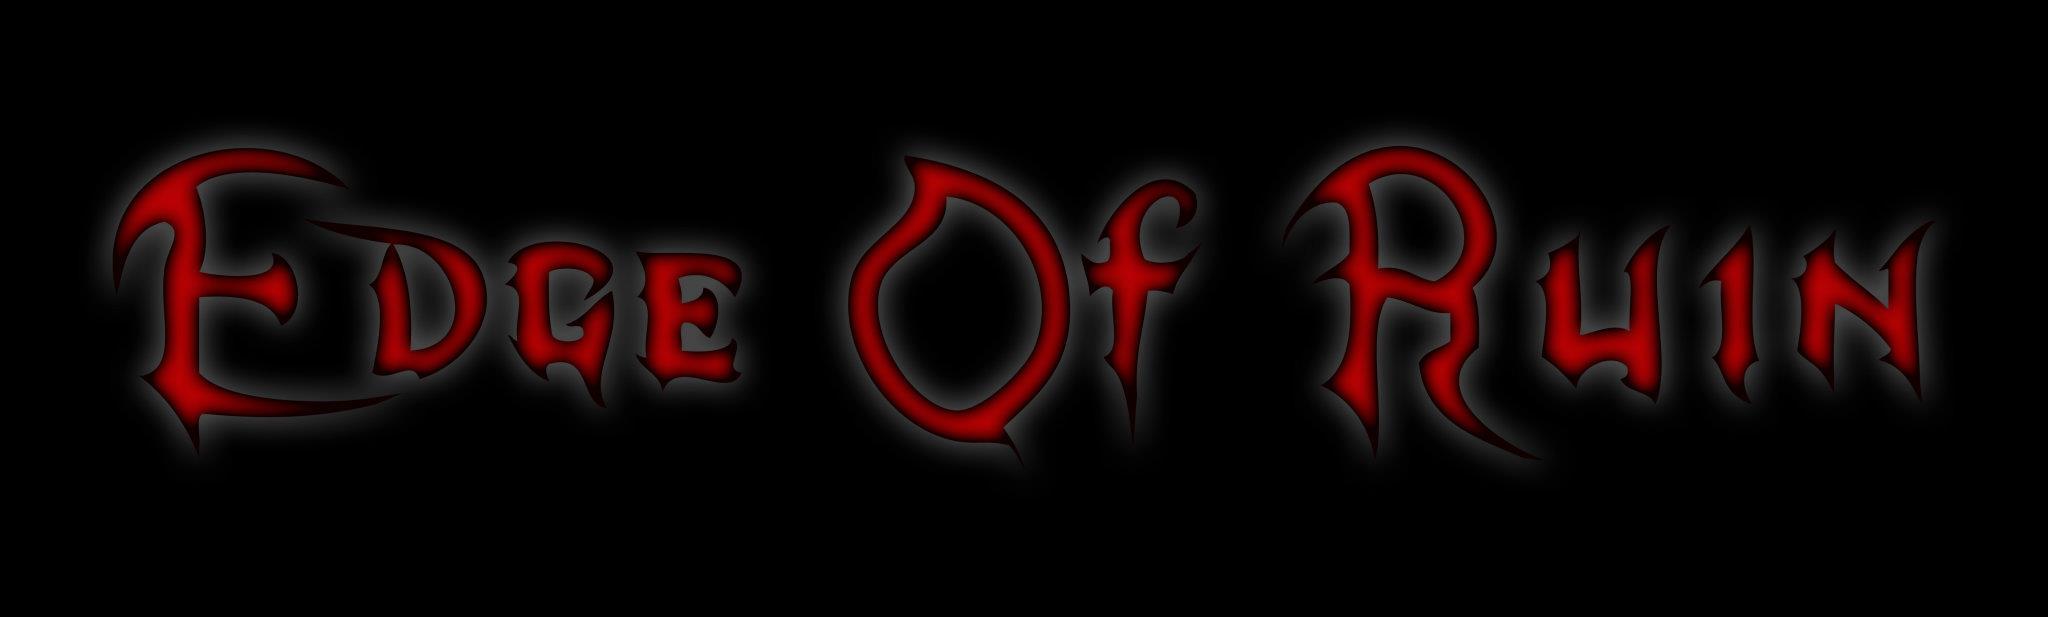 Edge of Ruin - Logo